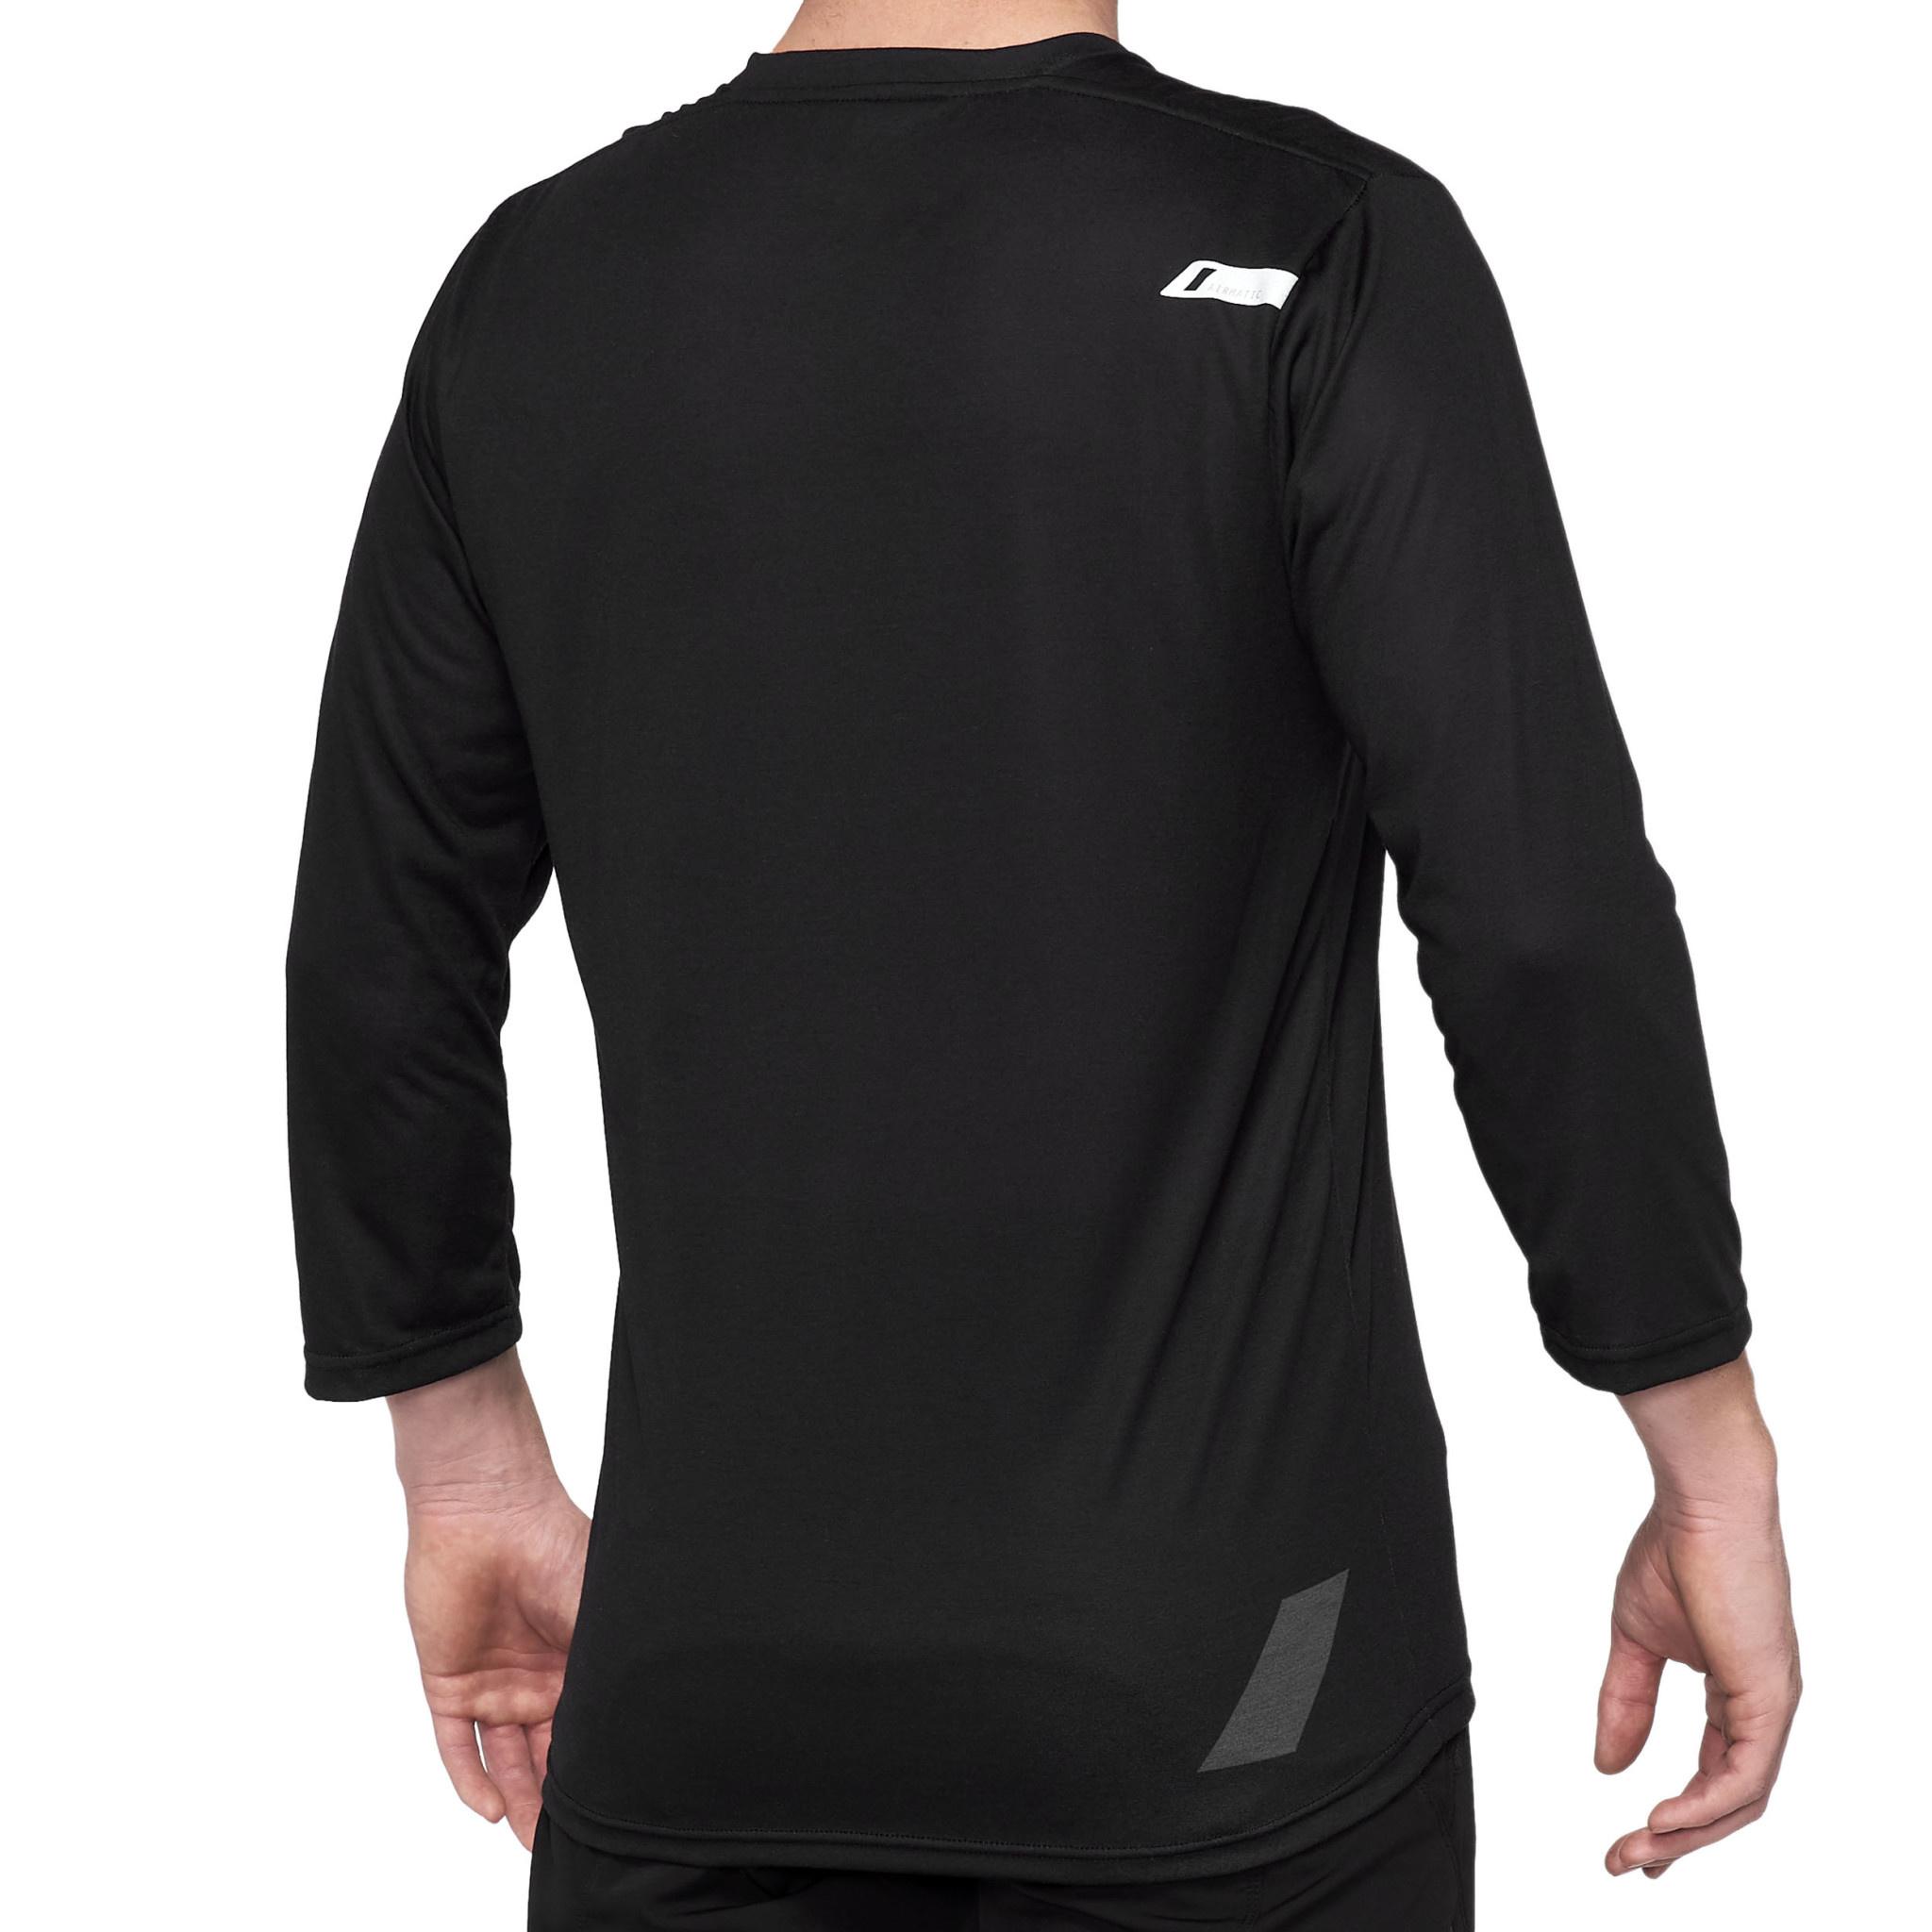 100% Airmatic 3/4 jersey Black-2